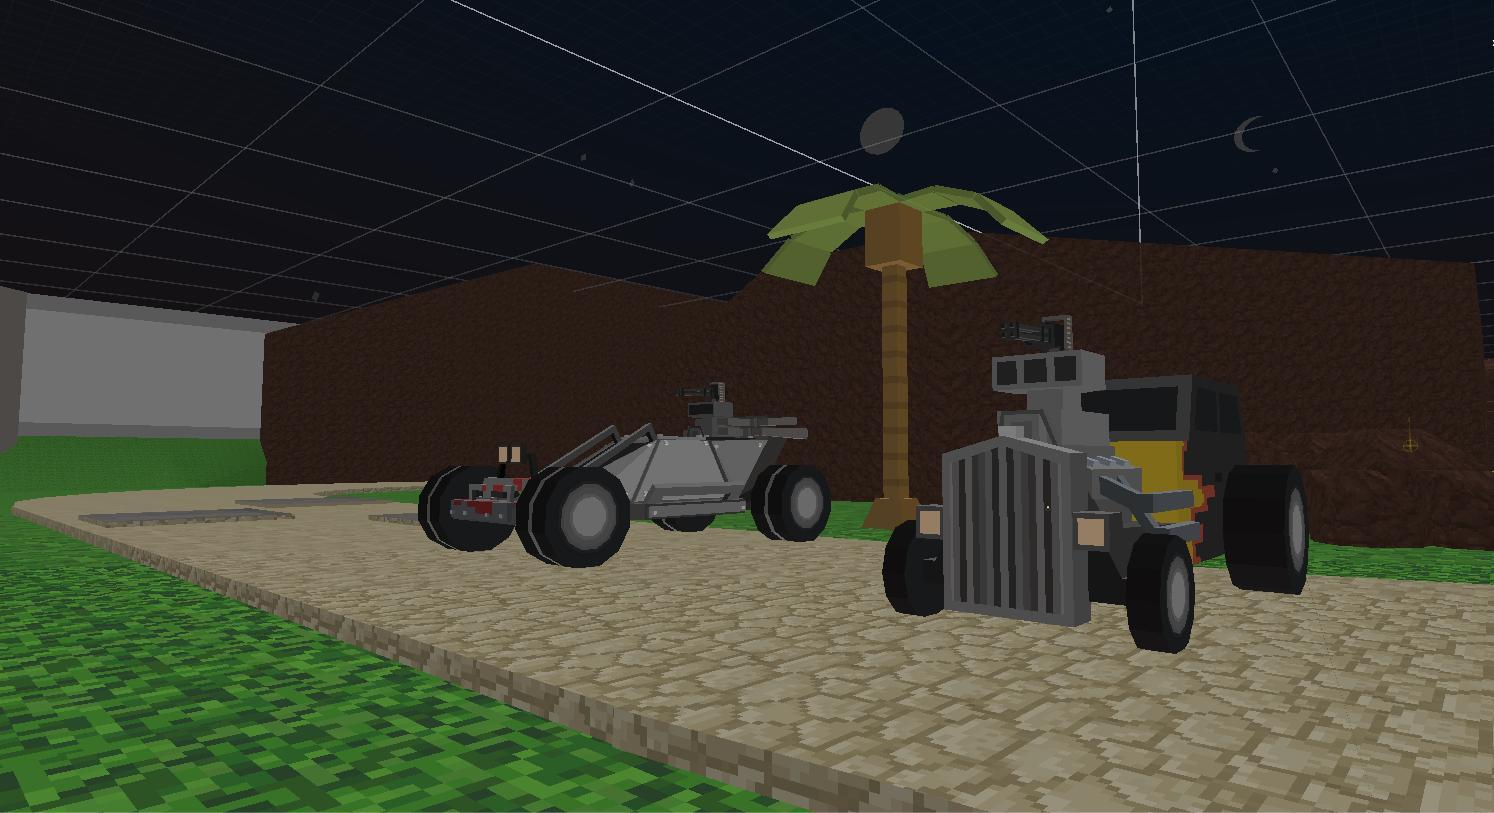 Blocky Combat Strike Zombie Survival 1.25 Screenshot 6